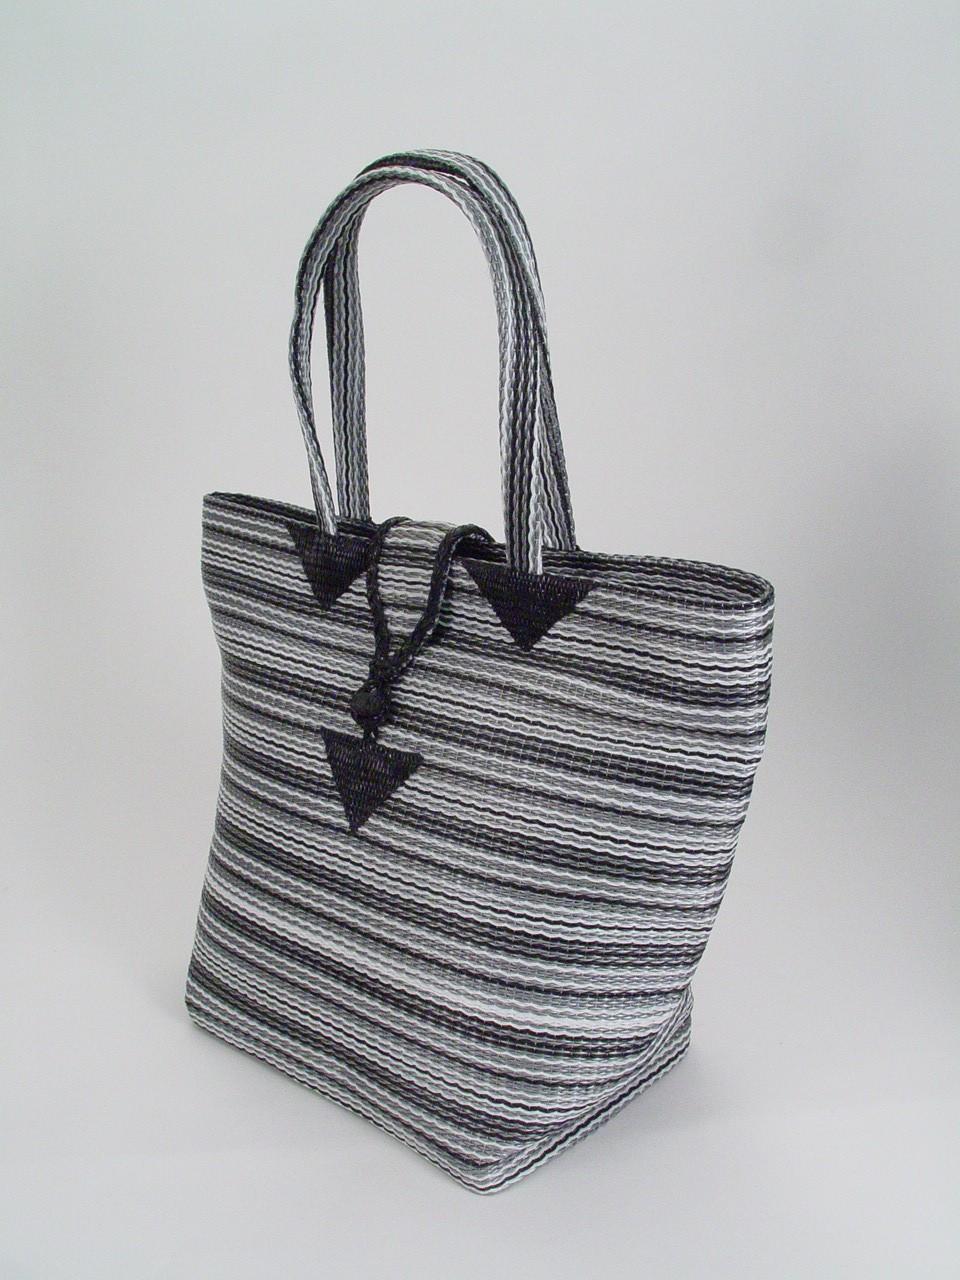 tote bag plastic fabric tote bag cooler tote bag large leather tote bag zippered